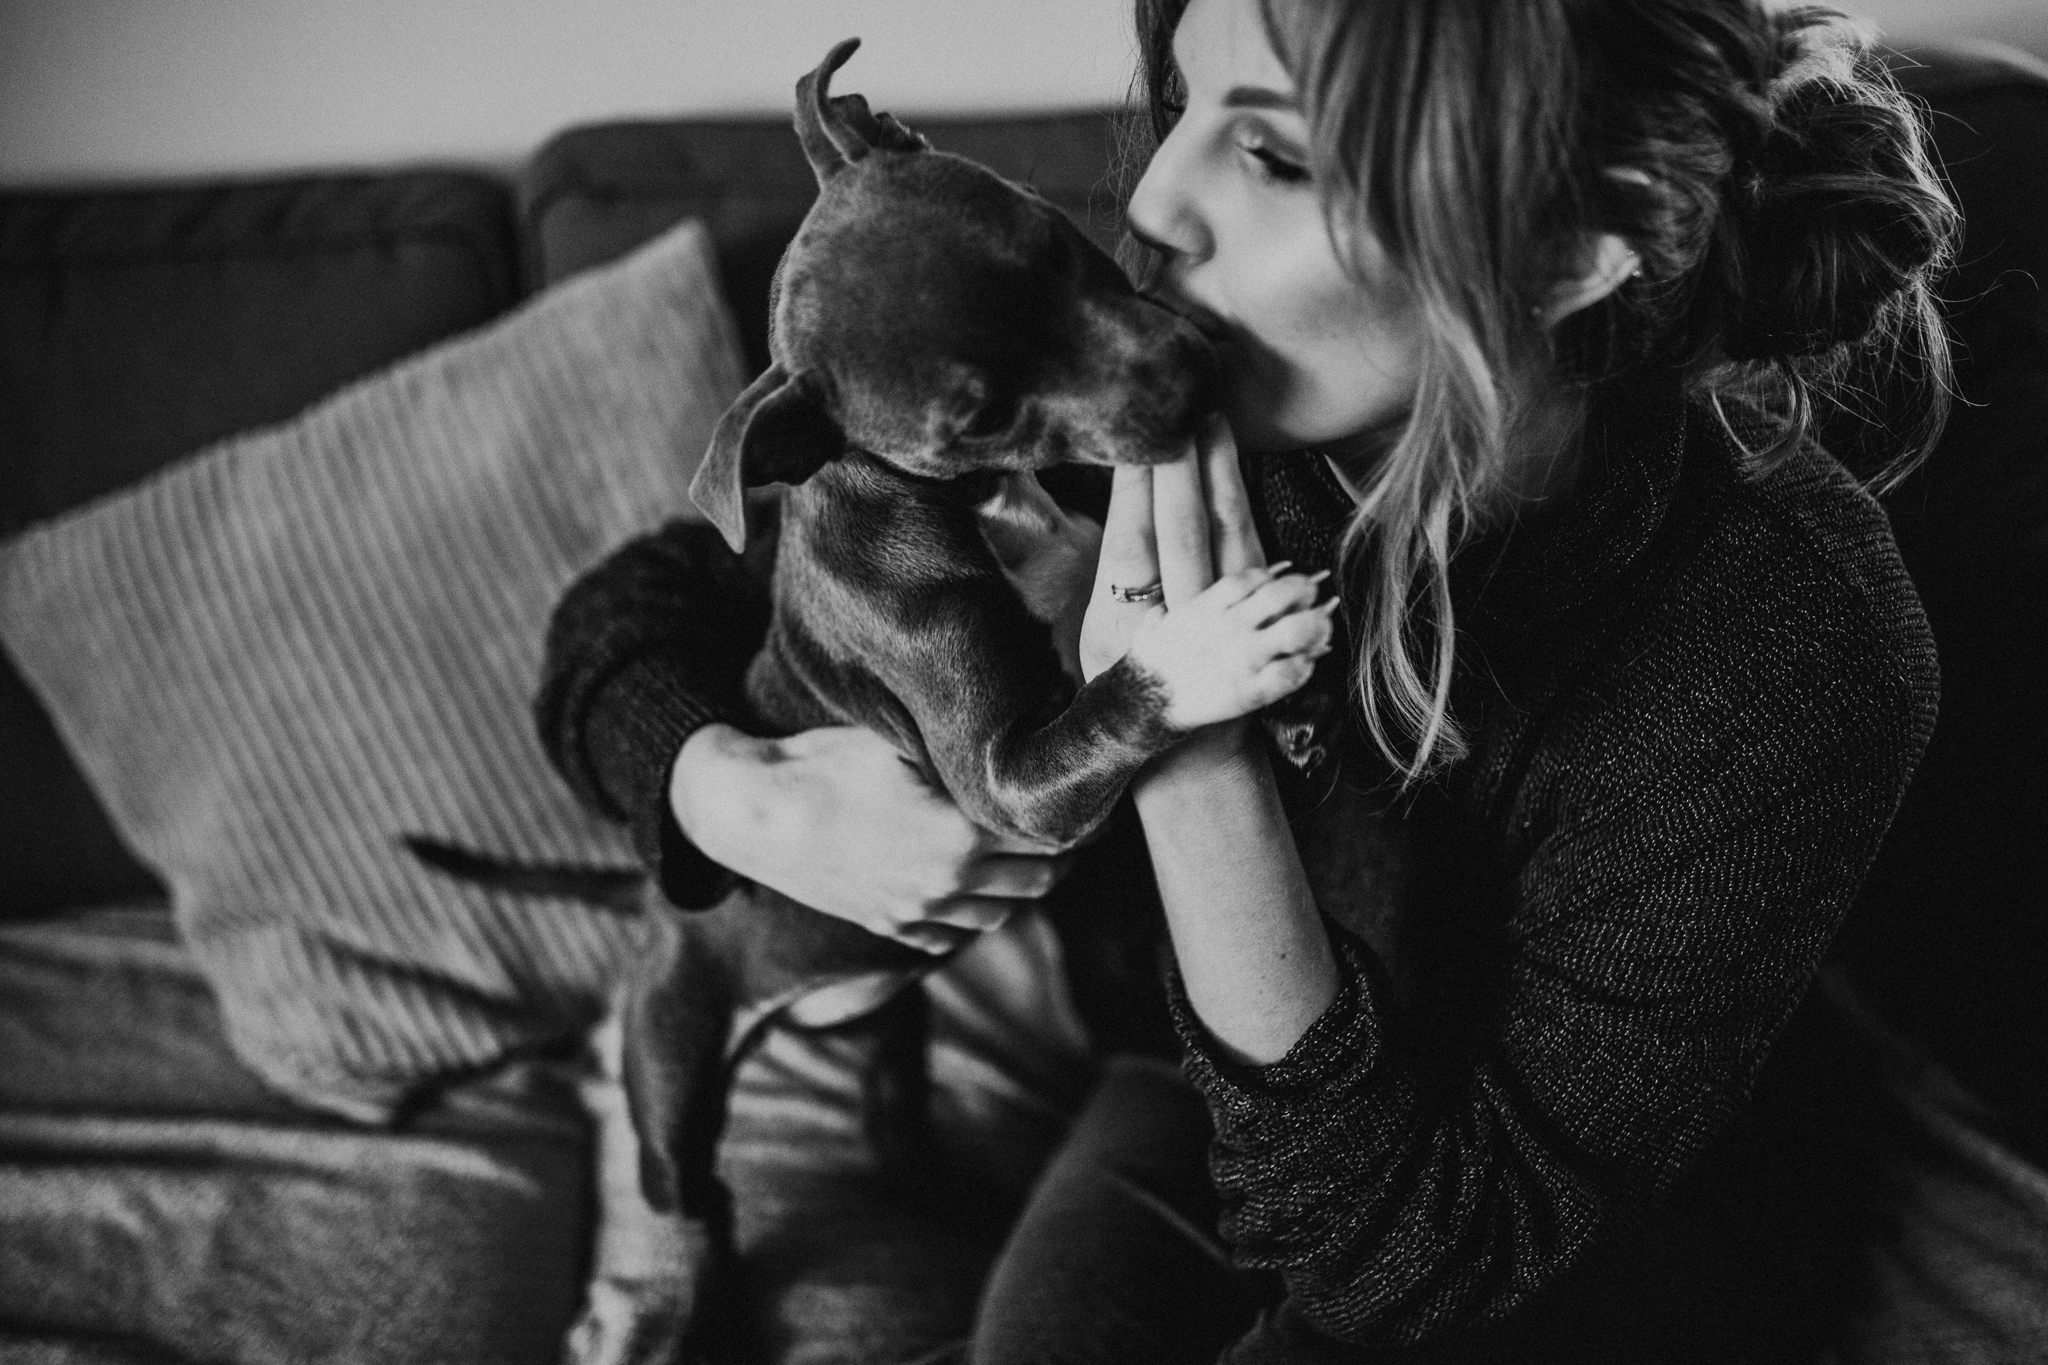 Dog-Human-Session-Photography-Darina-Stoda-Animal-Indigo-8.jpg